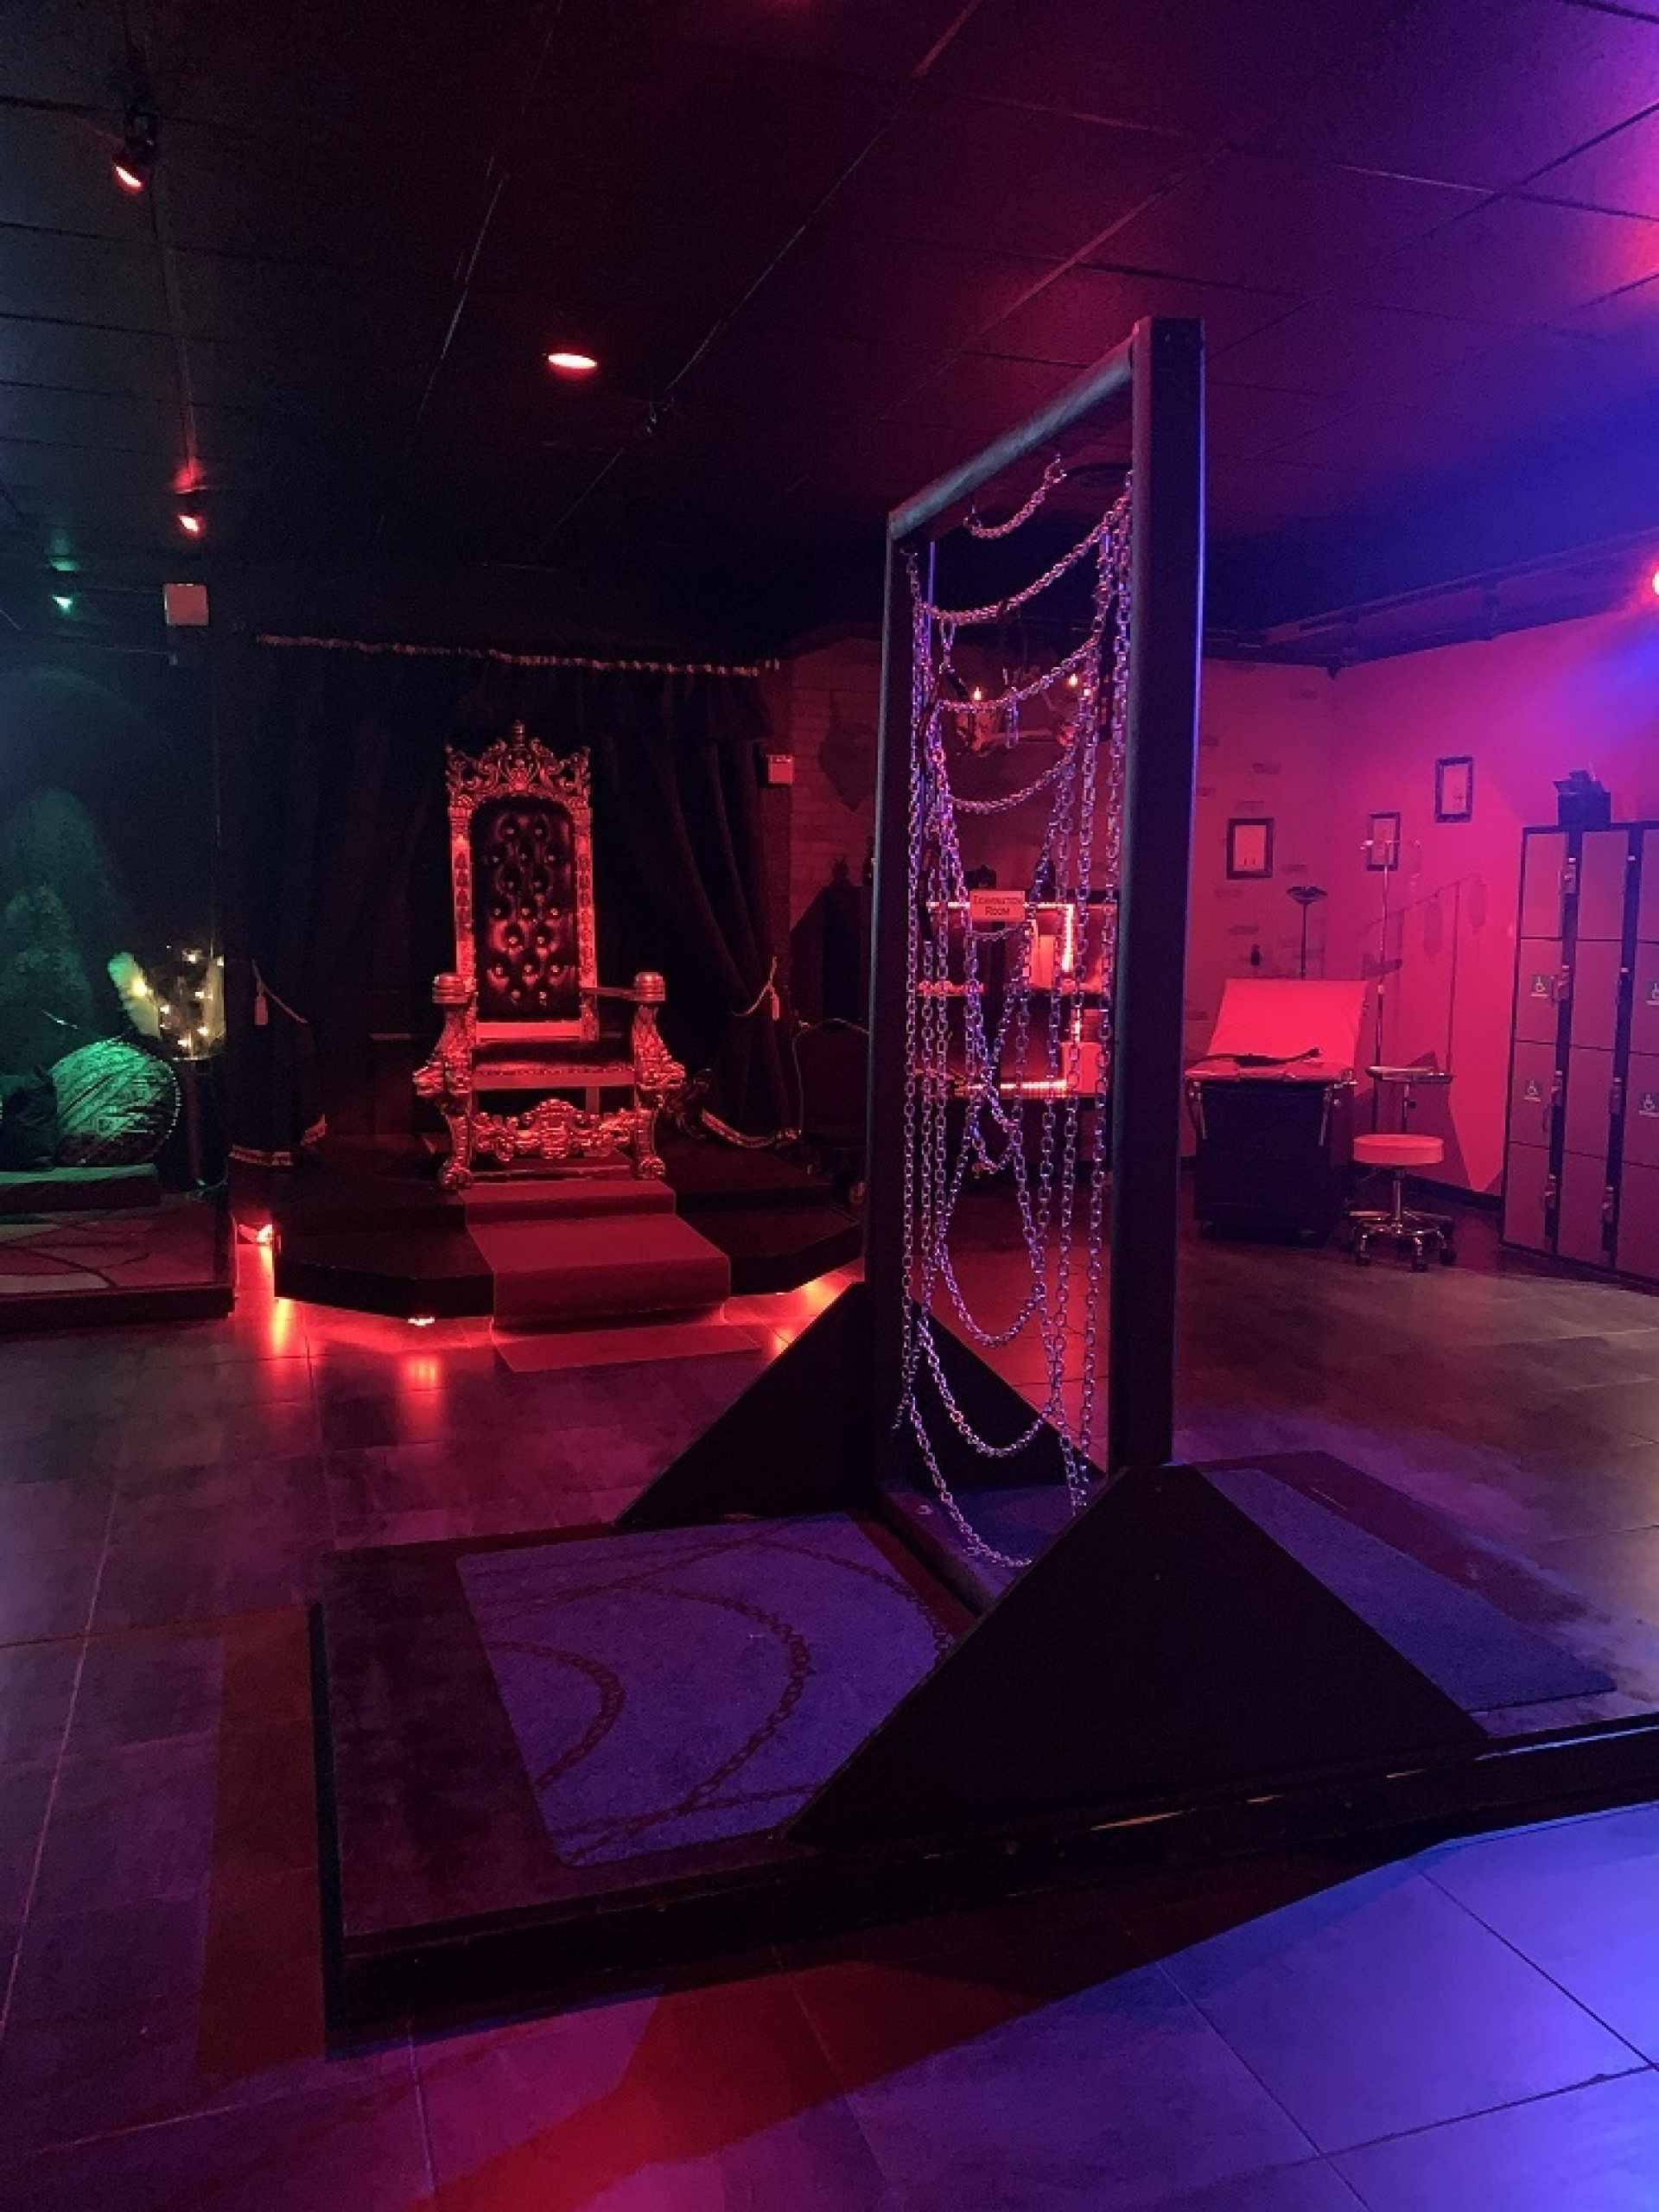 SDC Secrets Hideaway Swingers Lifestyle Club Resort